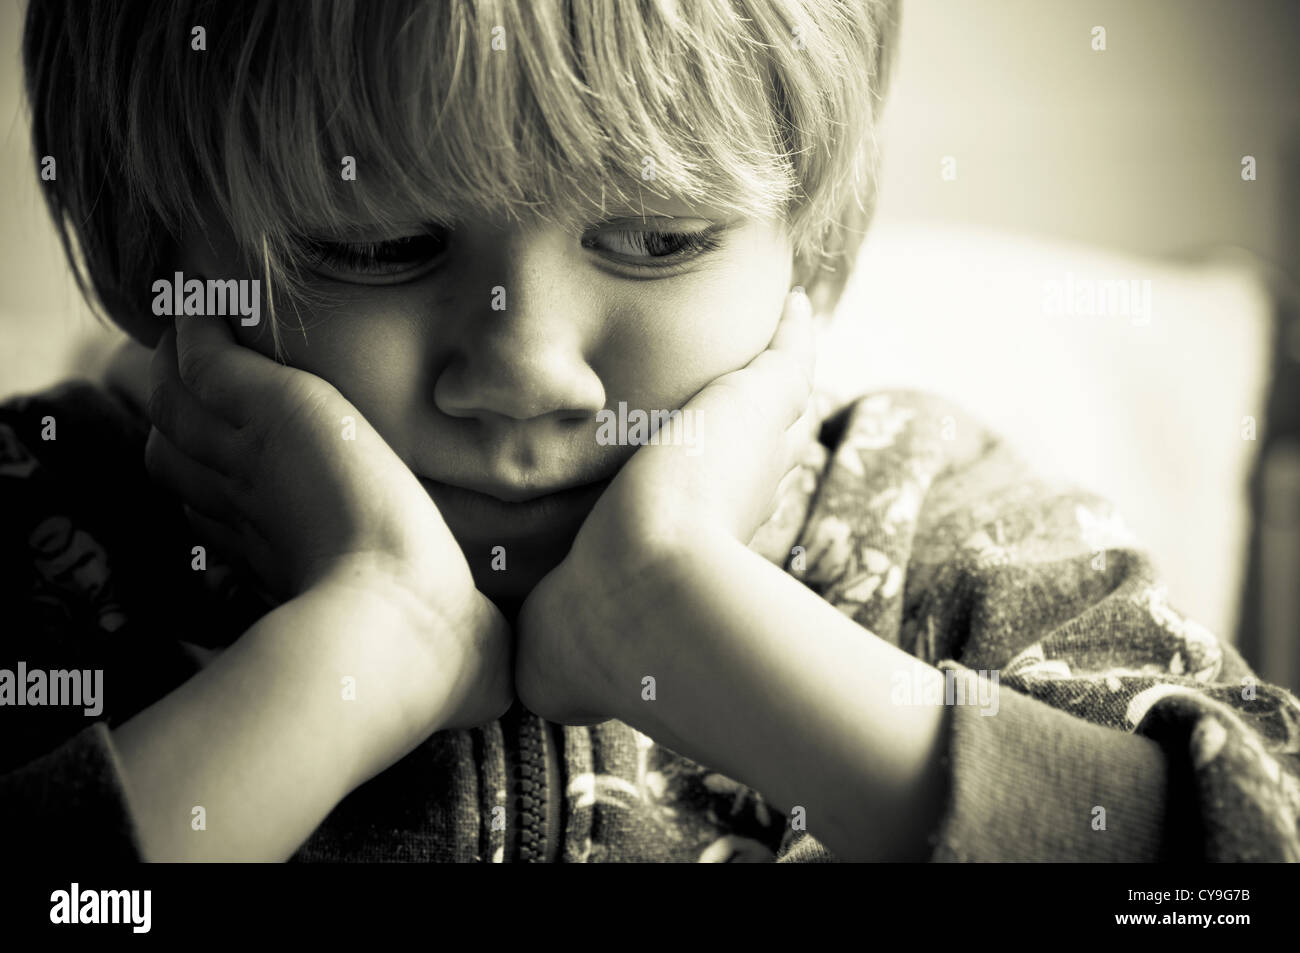 Child abuse - Stock Image